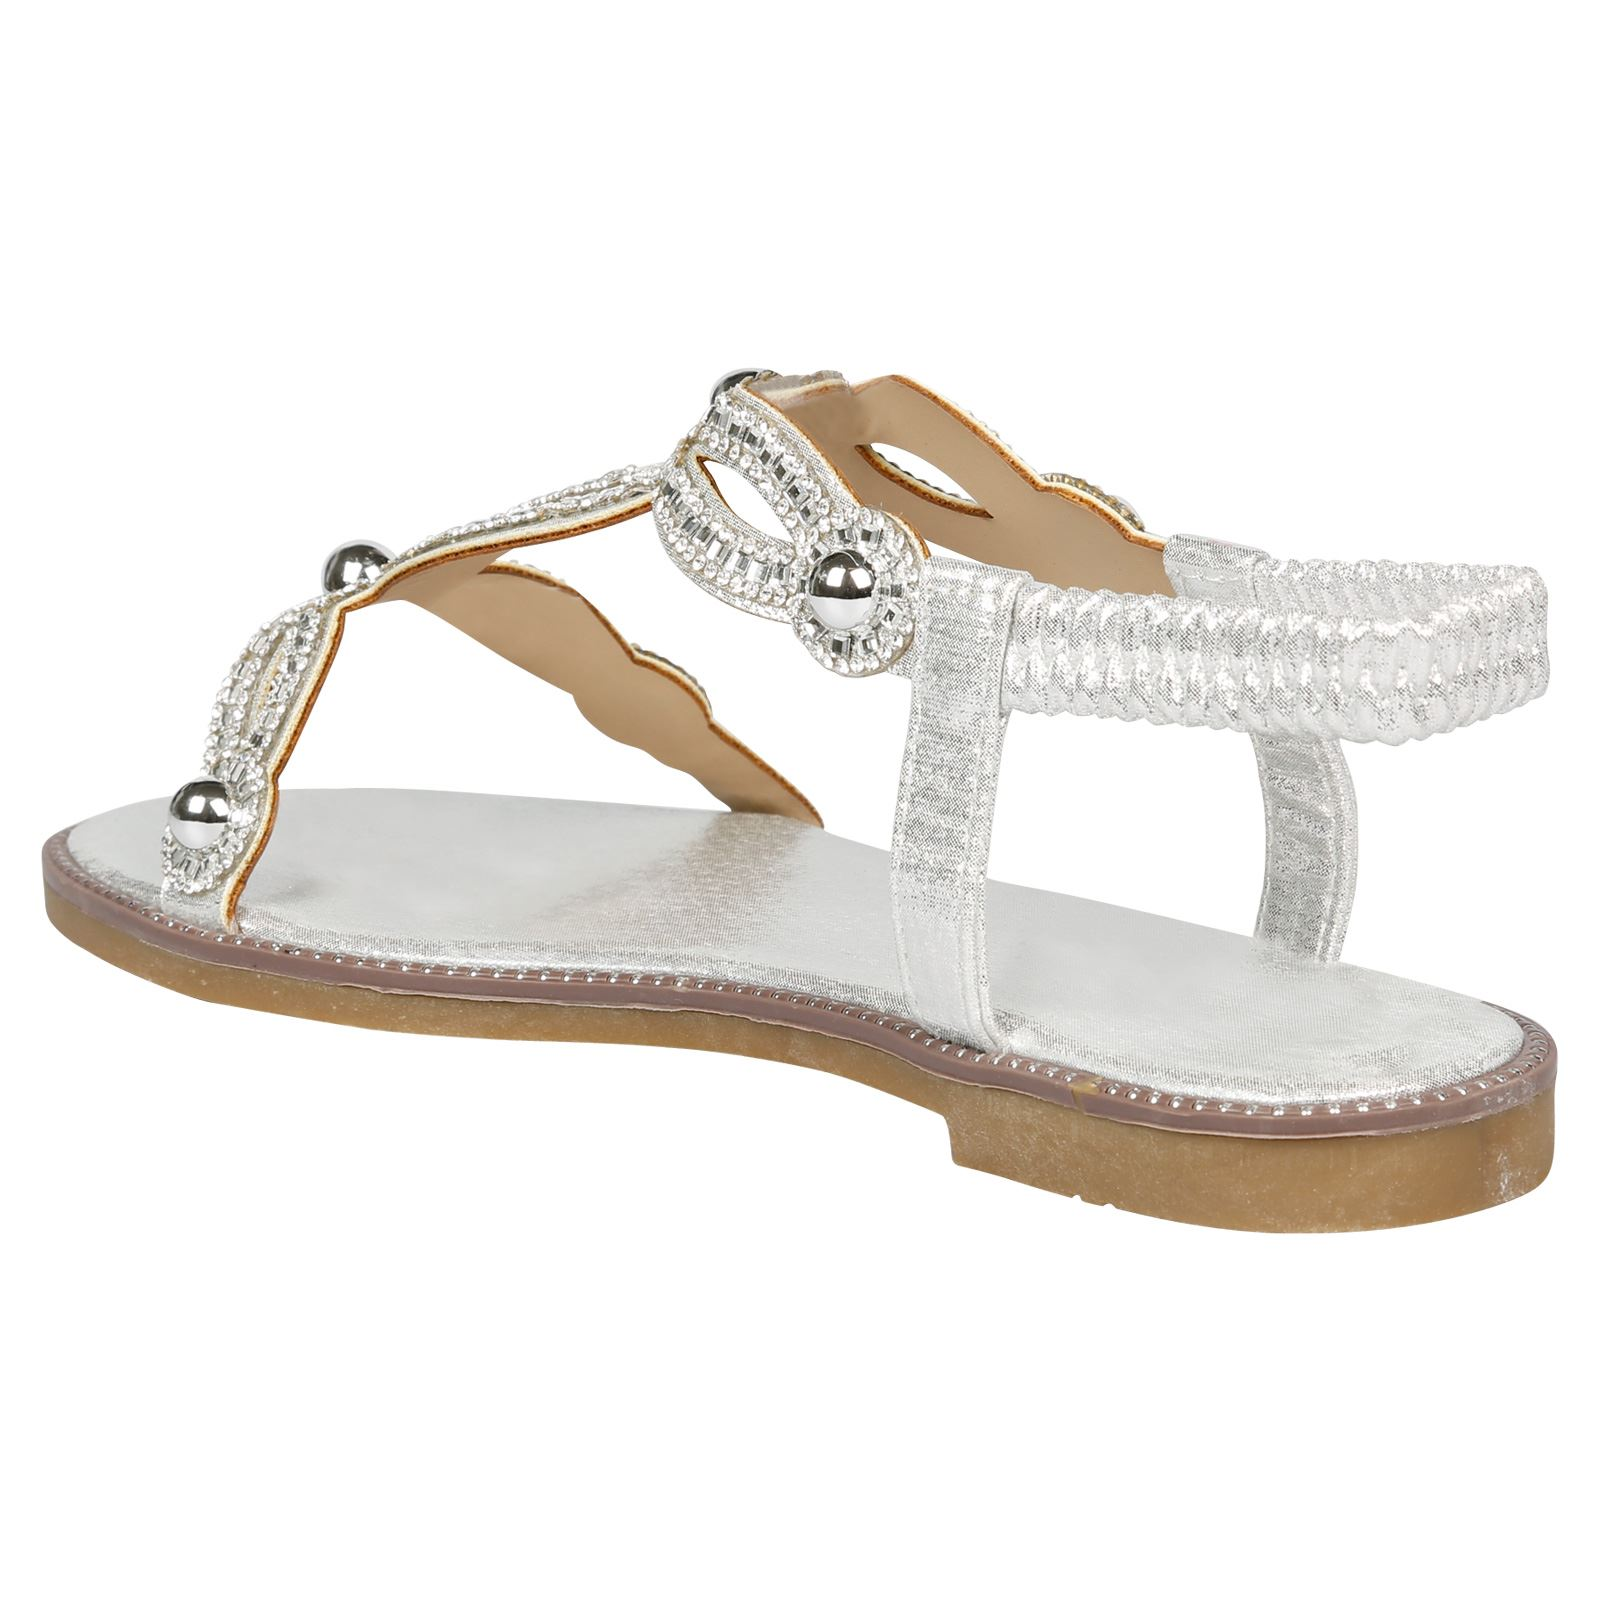 f5f53c24ddd Elle Womens Flats Peep Toe Diamante Studded Sandals Ladies Summer ...